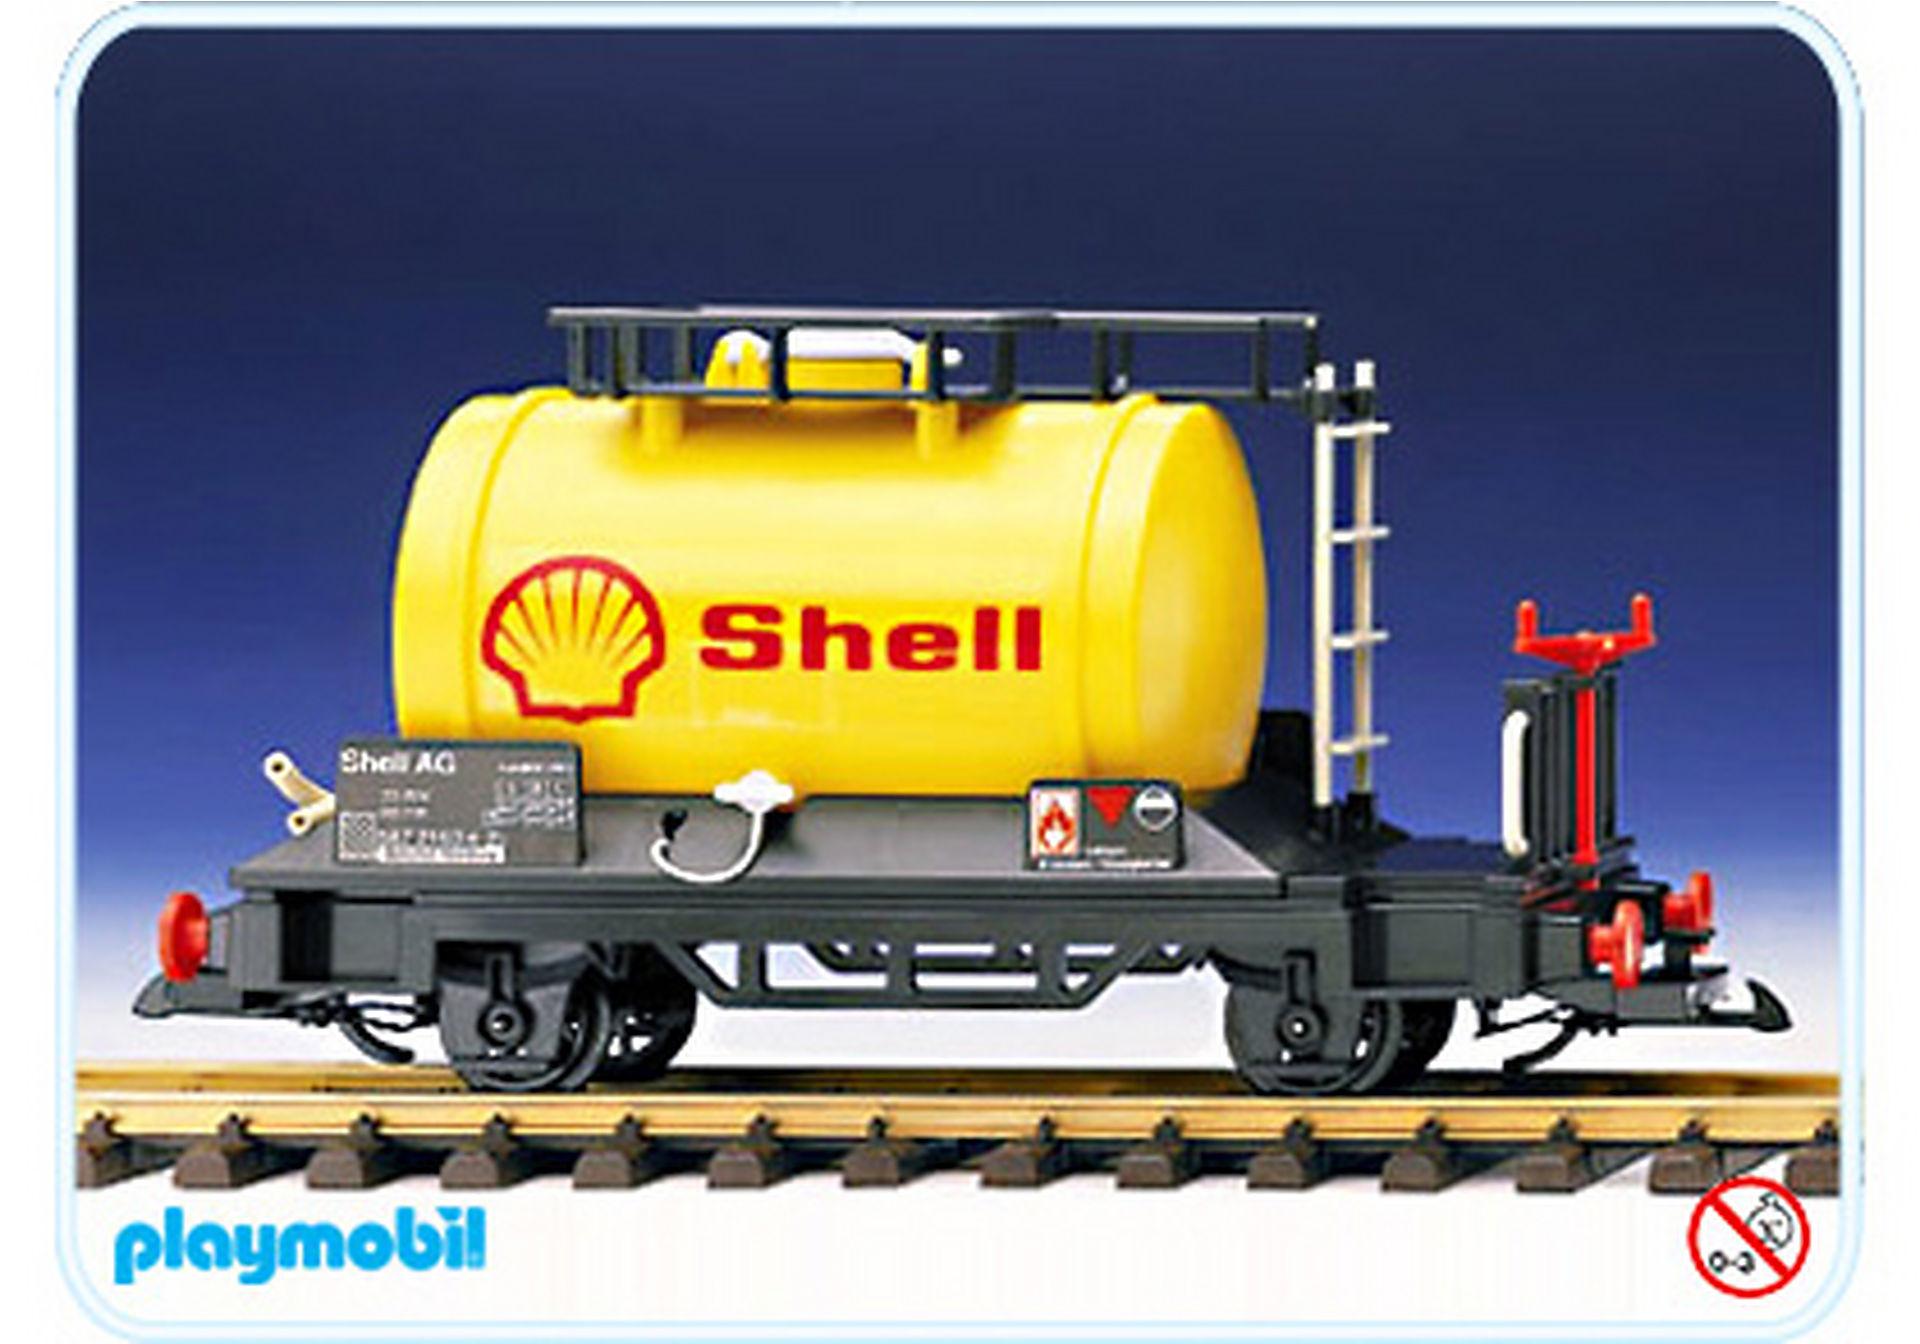 http://media.playmobil.com/i/playmobil/4107-A_product_detail/Kesselwagen Shell